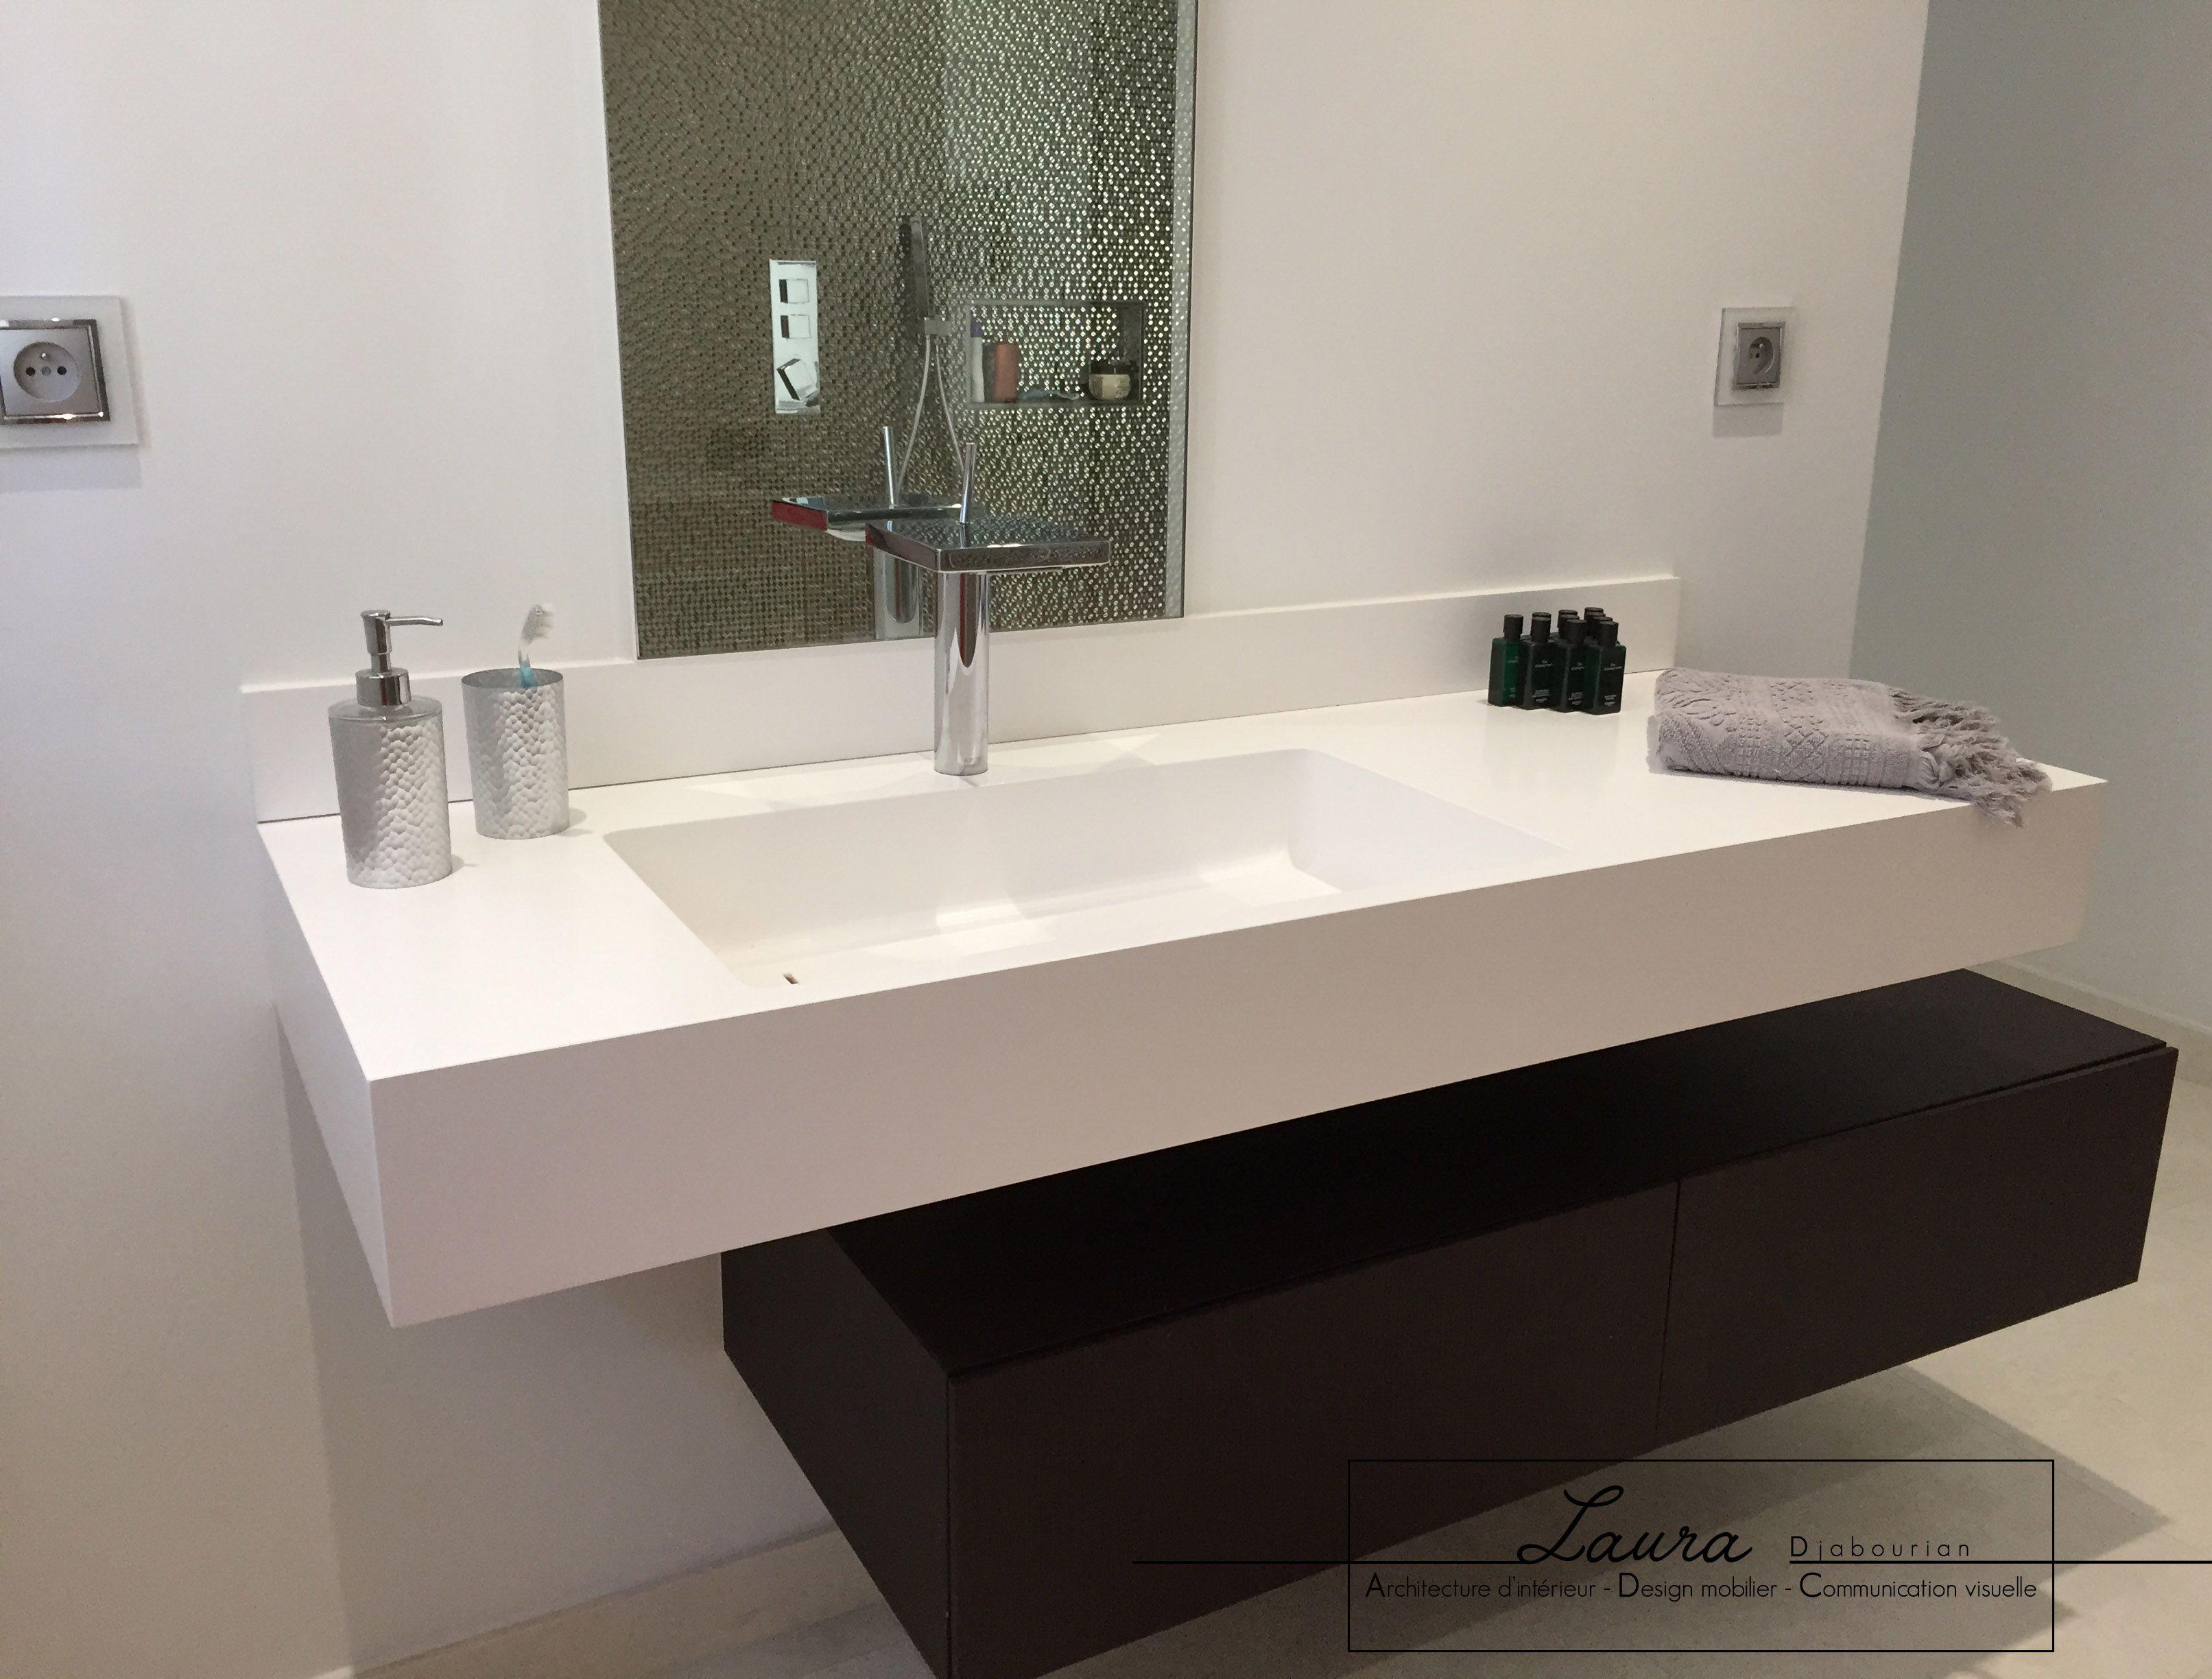 Salle de bain cr ation sur mesure du meuble de salle de Creation meuble salle de bain